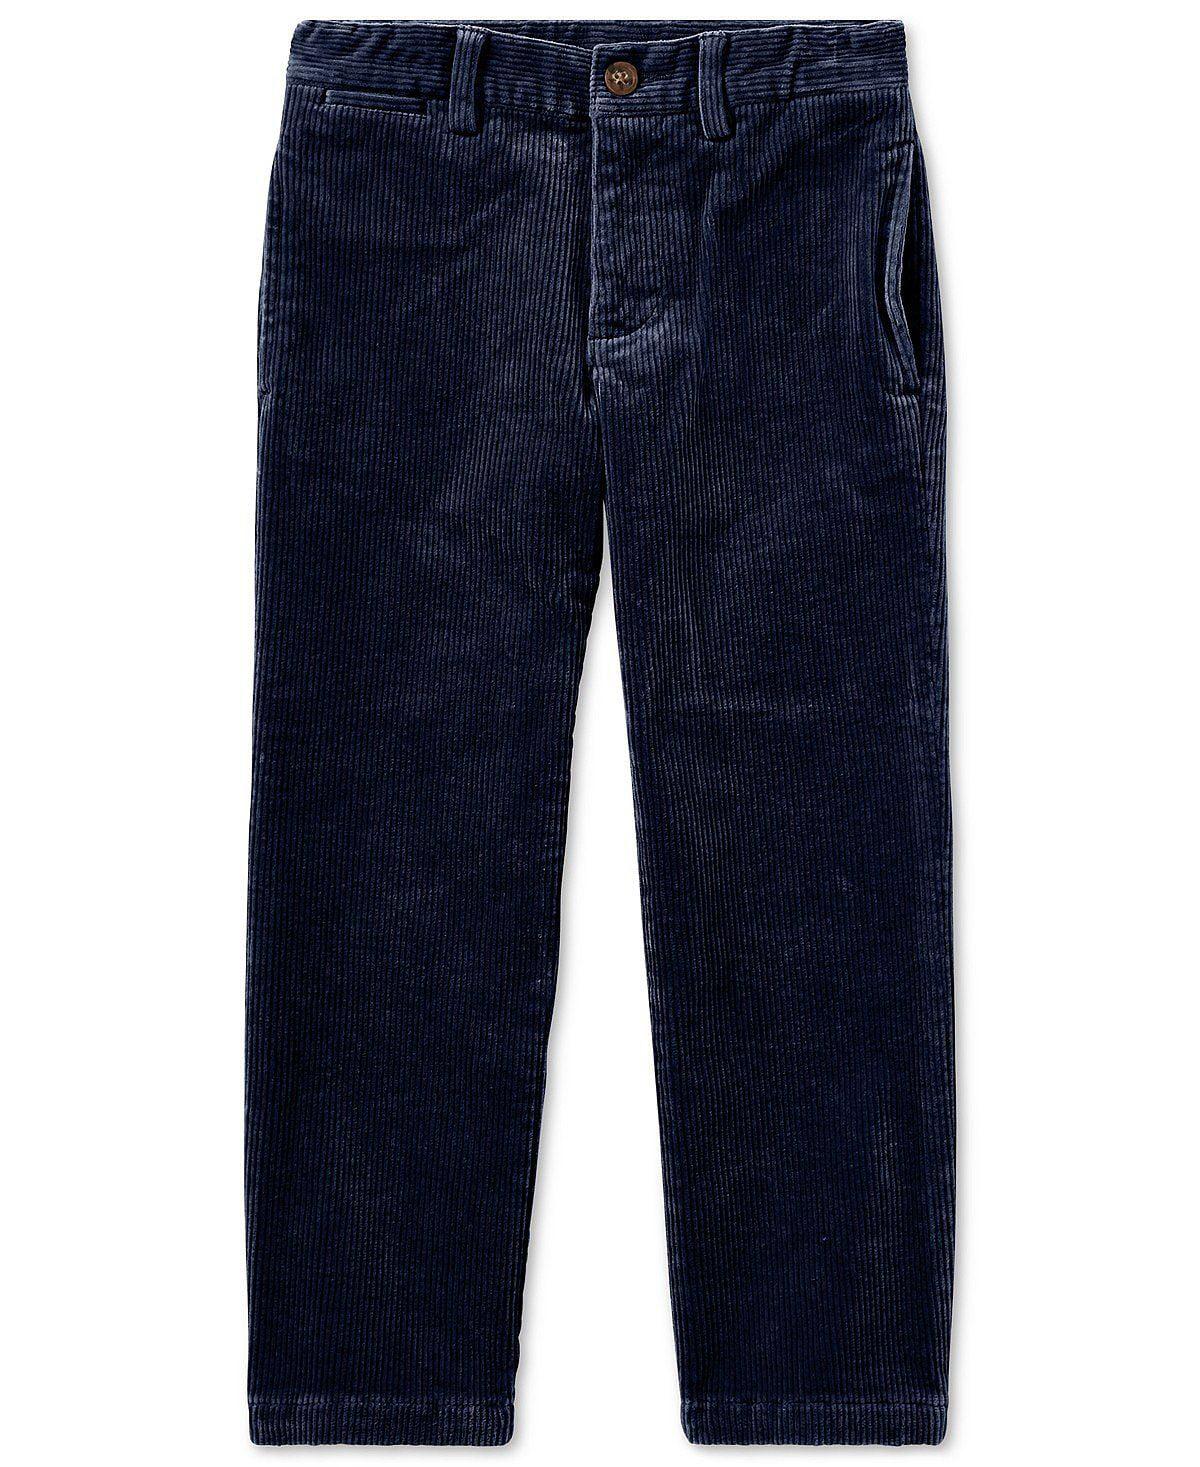 538d5472 Polo Ralph Lauren Baby Boys Stretch Corduroy Pants